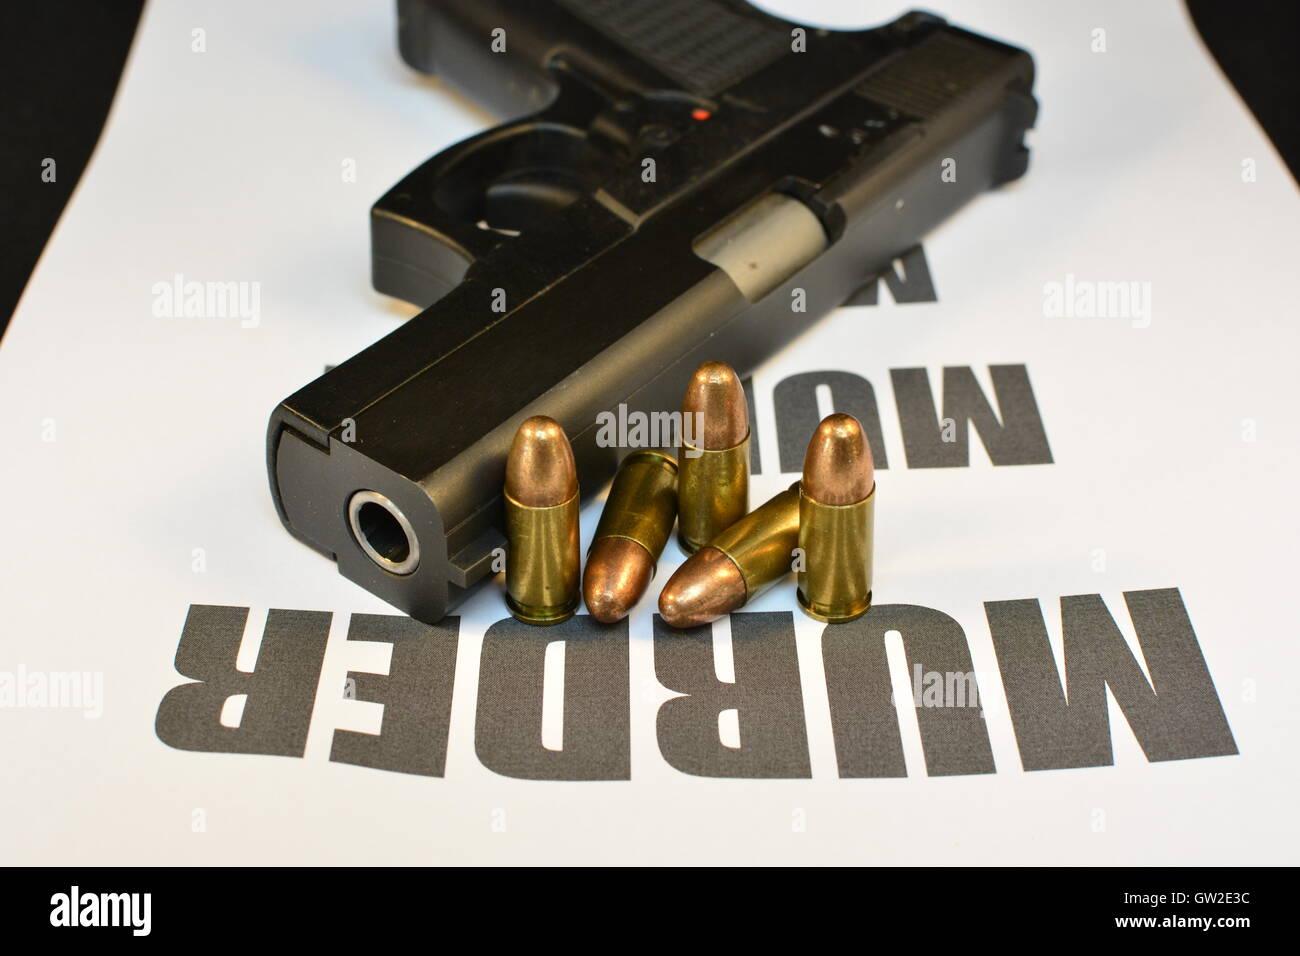 Crime Murder concept. Handgun with bullets. Gun violence. Shooting. - Stock Image